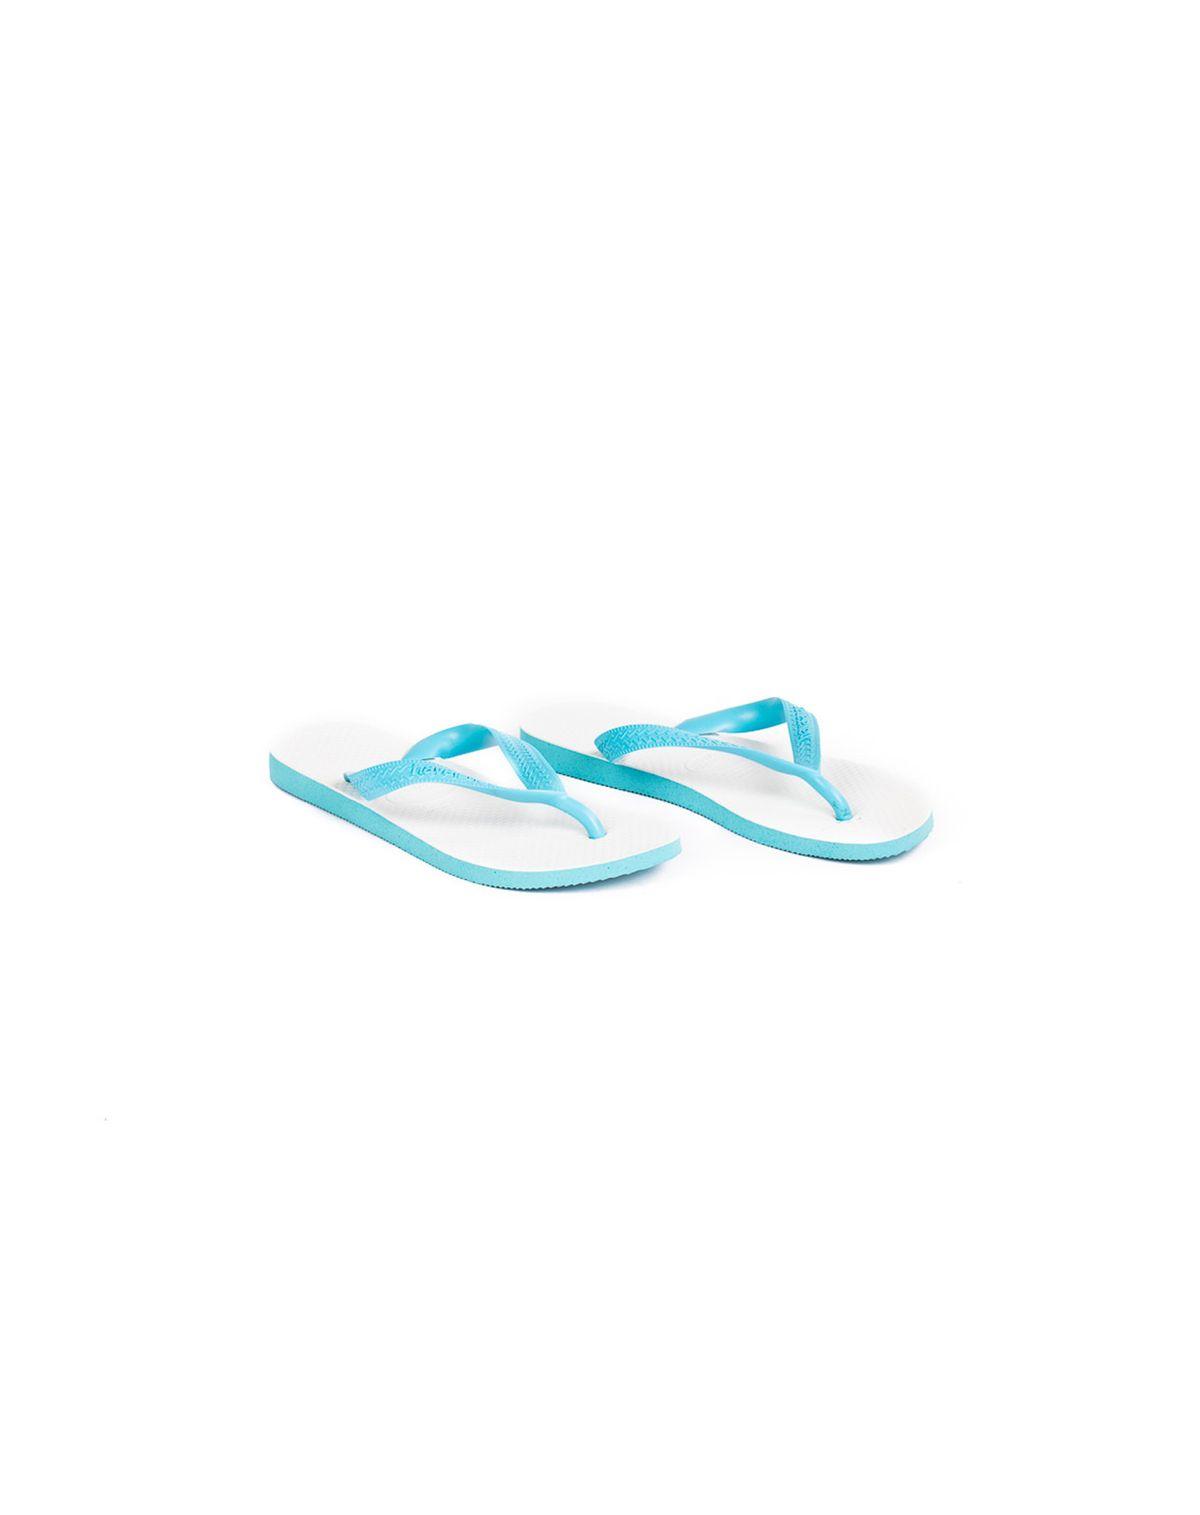 567860003-chinelo-havaianas-tradicional-azul-39-0-9e1